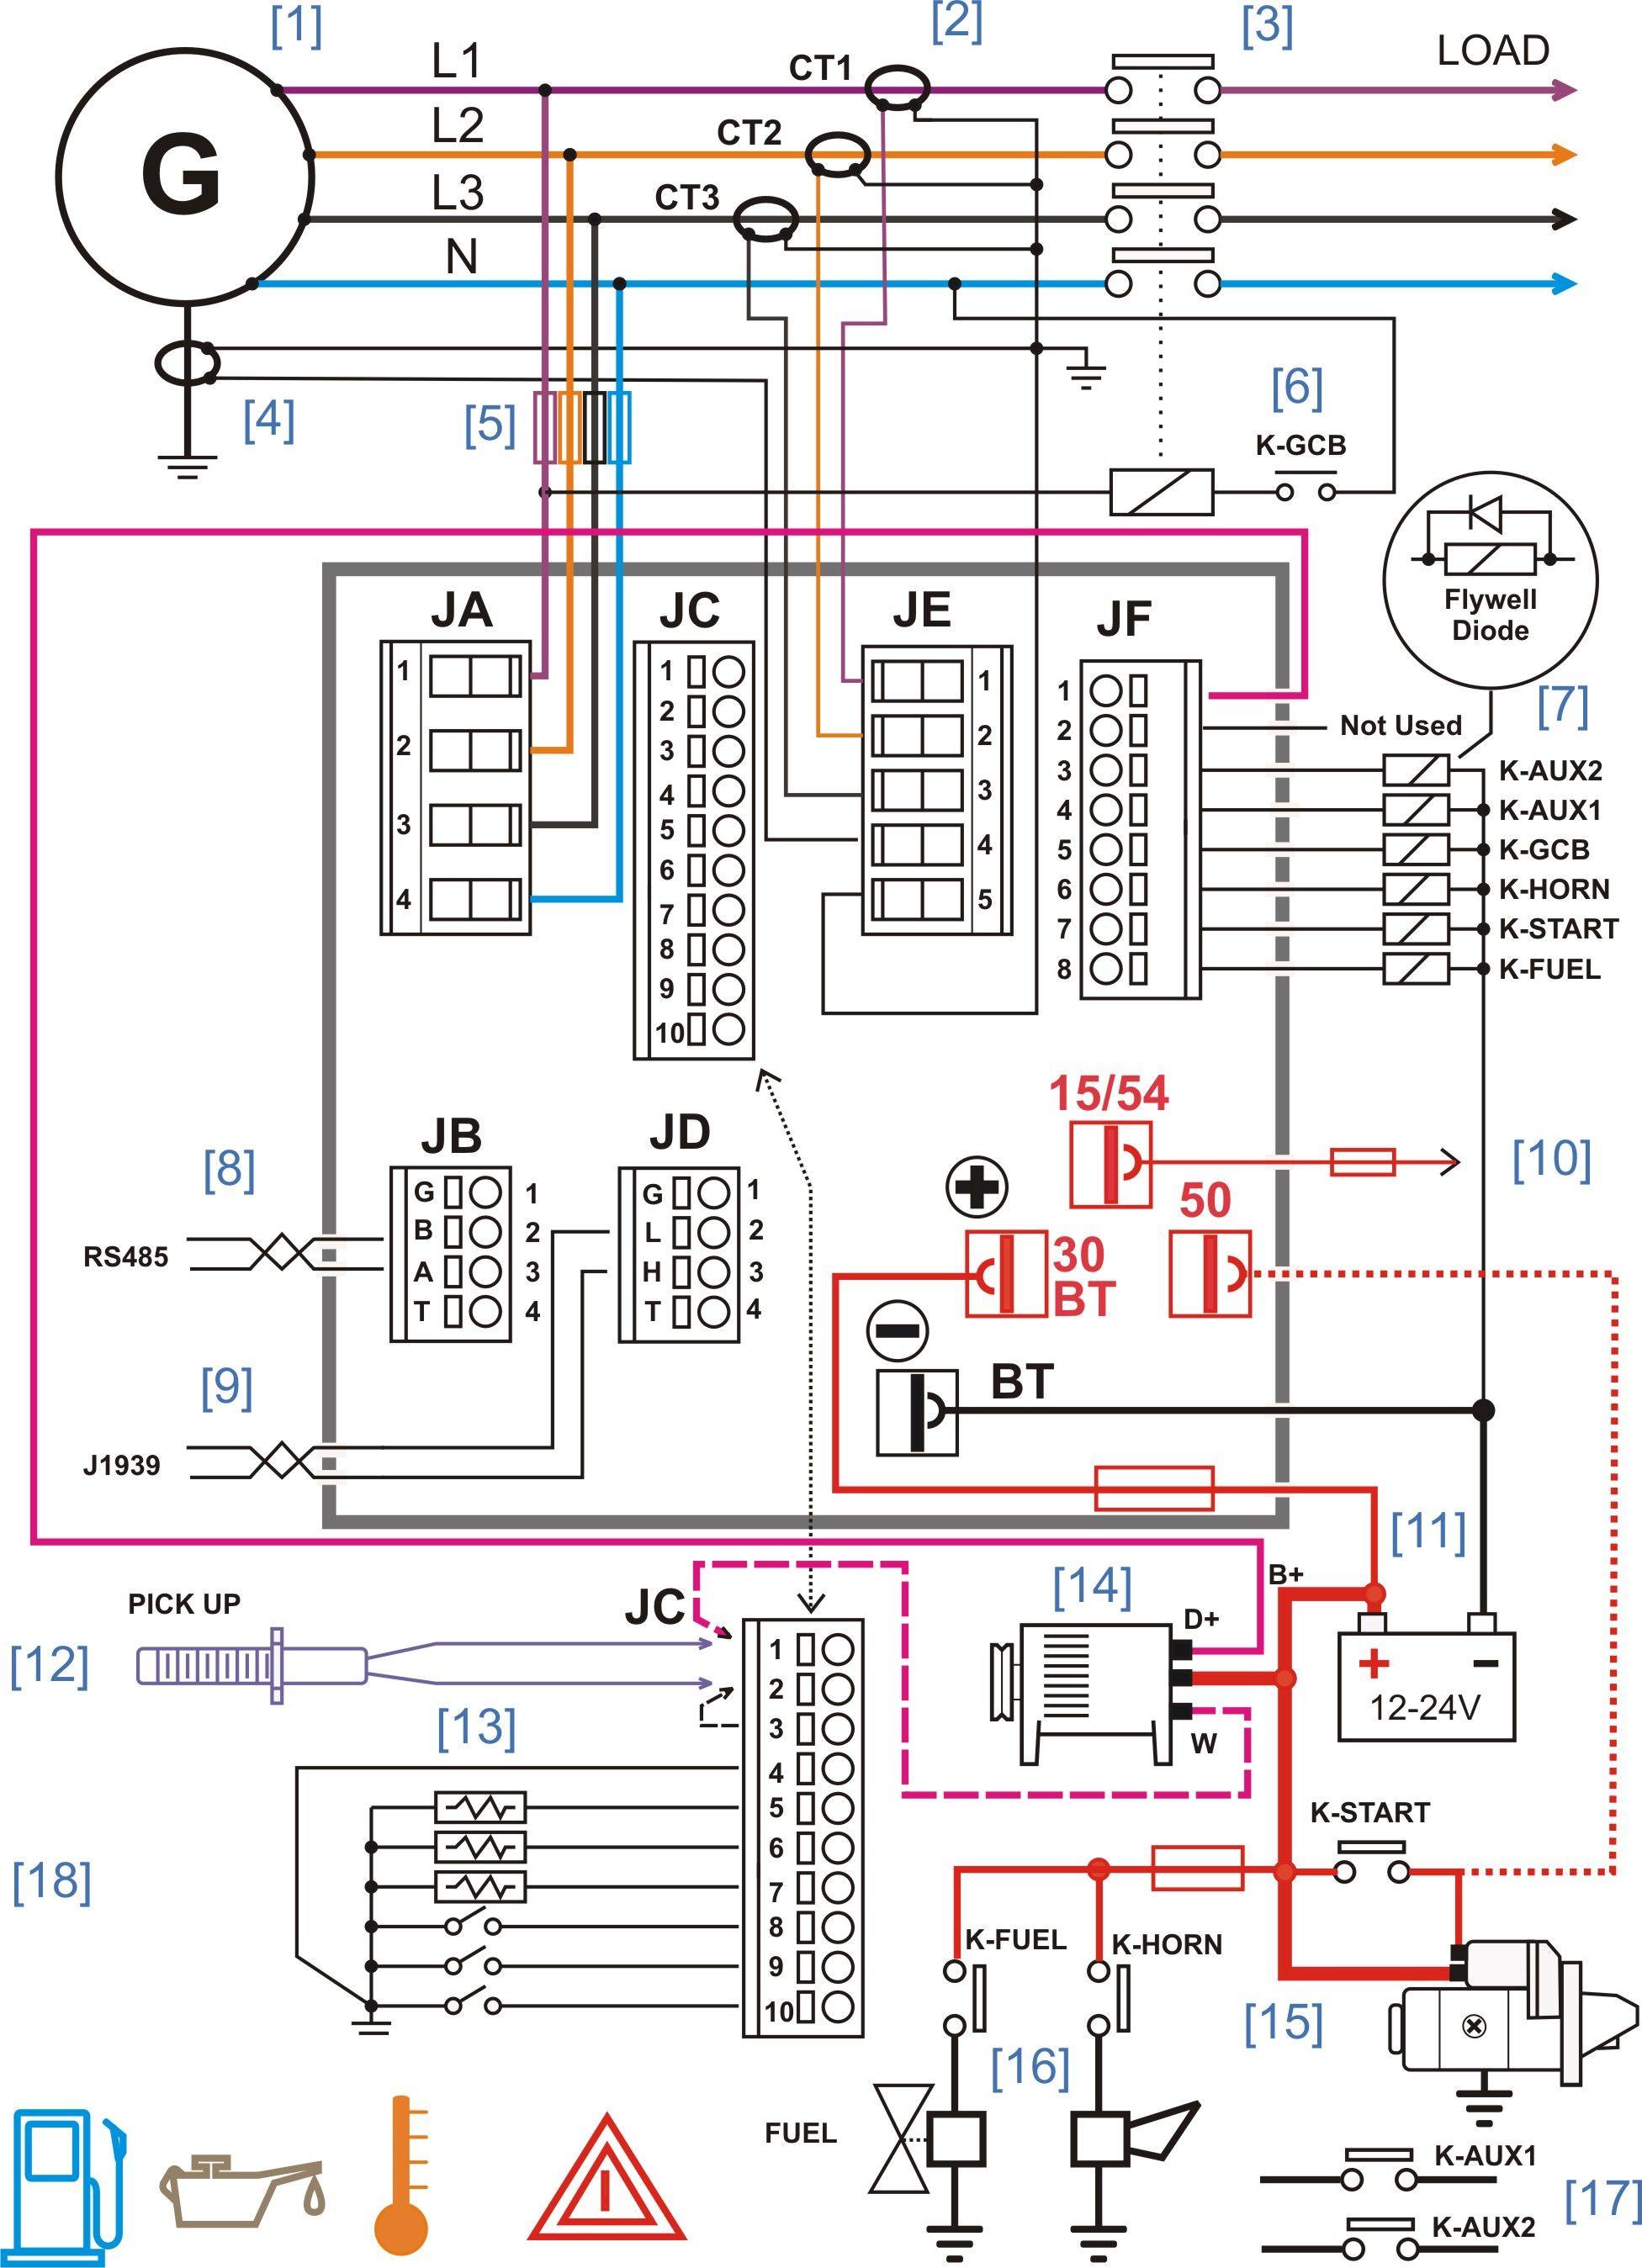 diagram plc wiring diagram file qk28056 rh nelia higdon diagram hansafanprojekt de